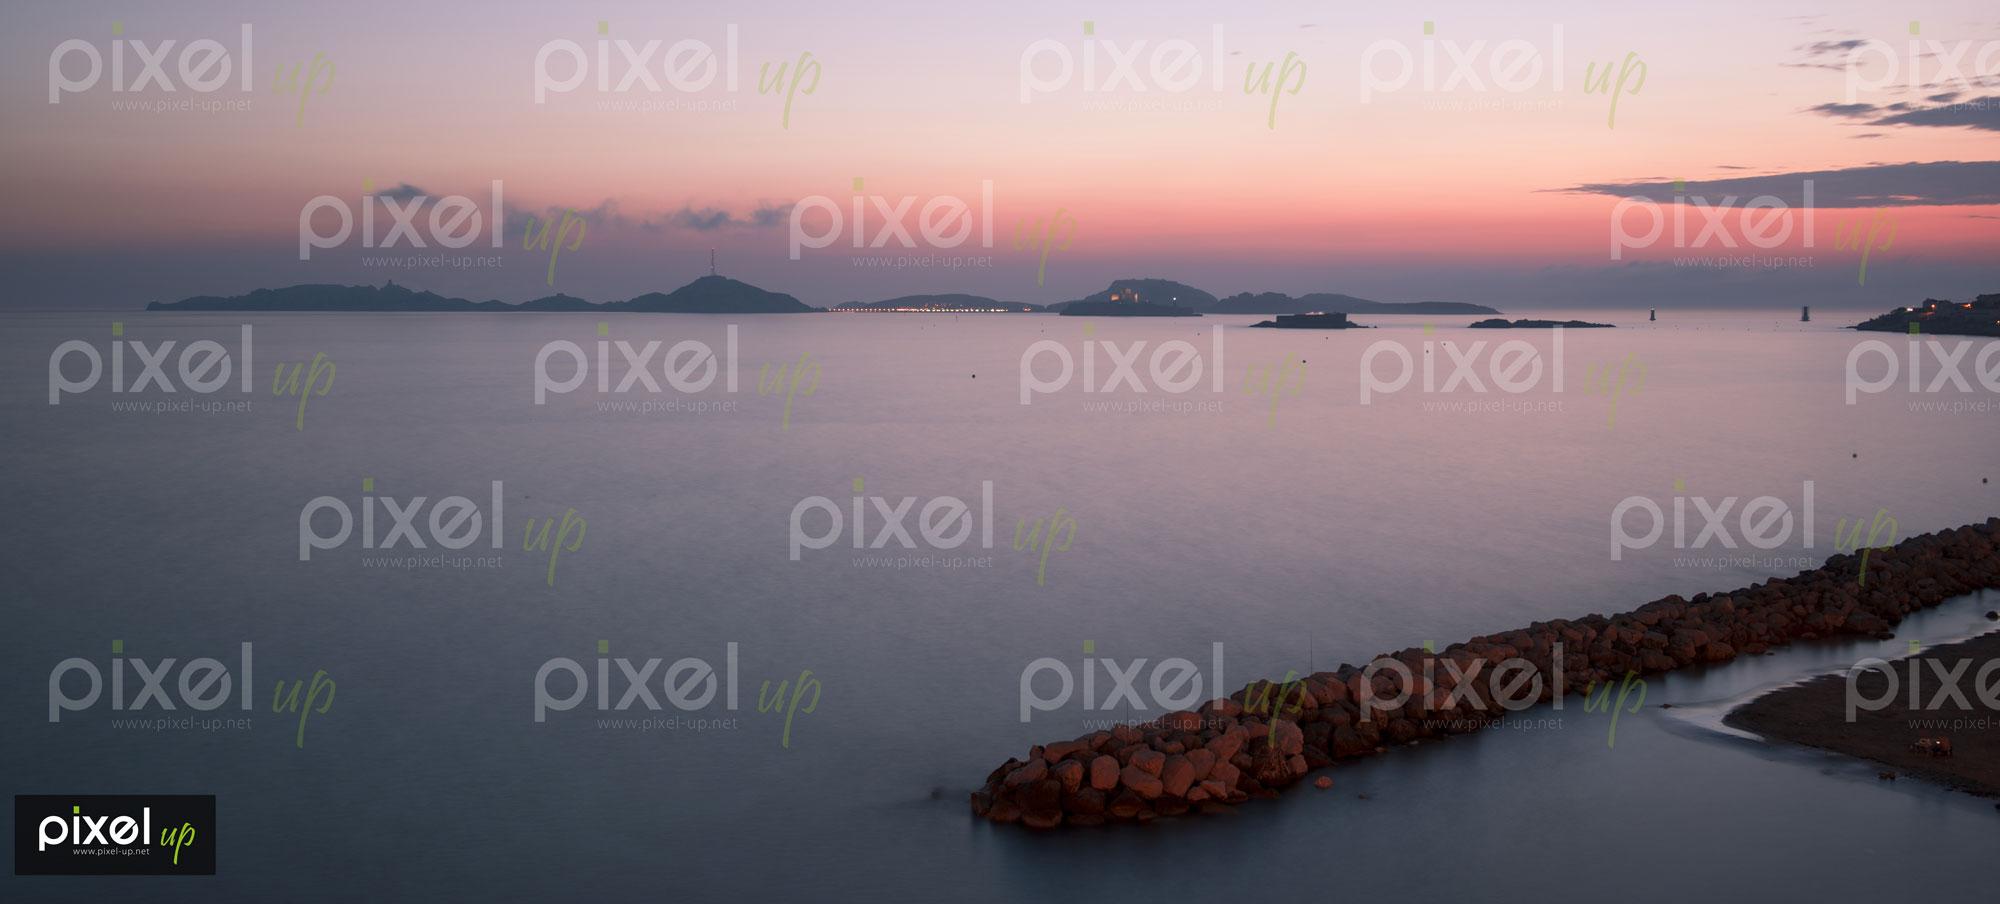 Photographe Pixel up - Marseille